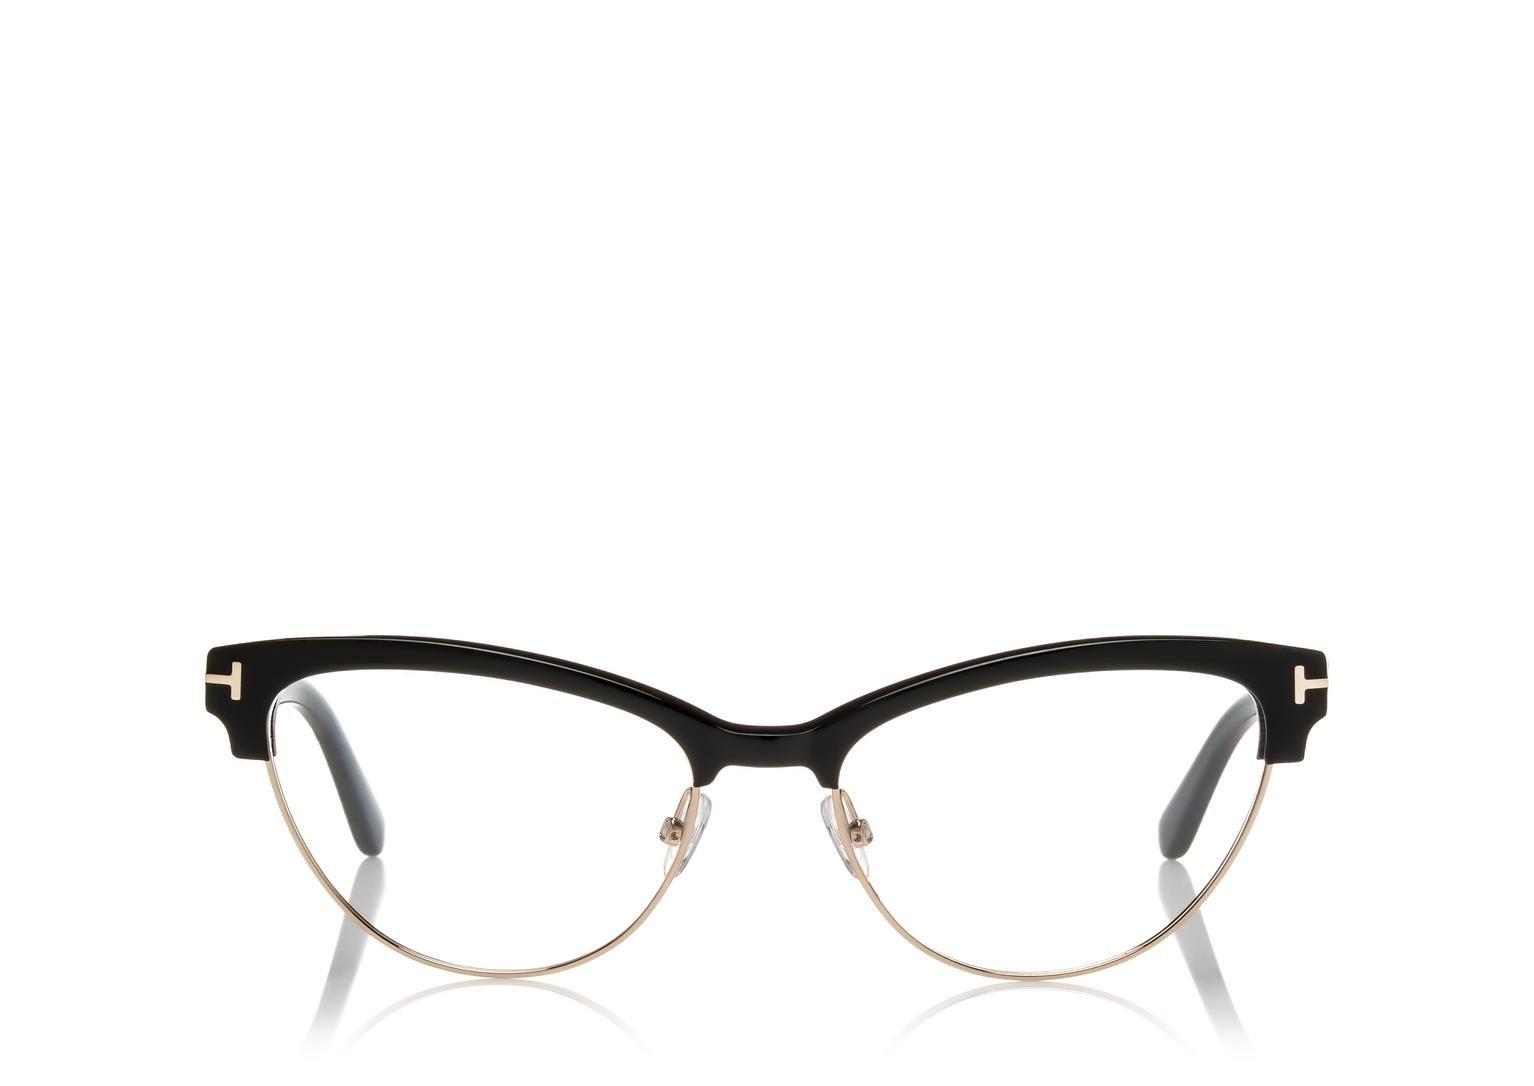 SLIGHT CATEYE FRAME | Shop Tom Ford Online Store | Sunglasses ...